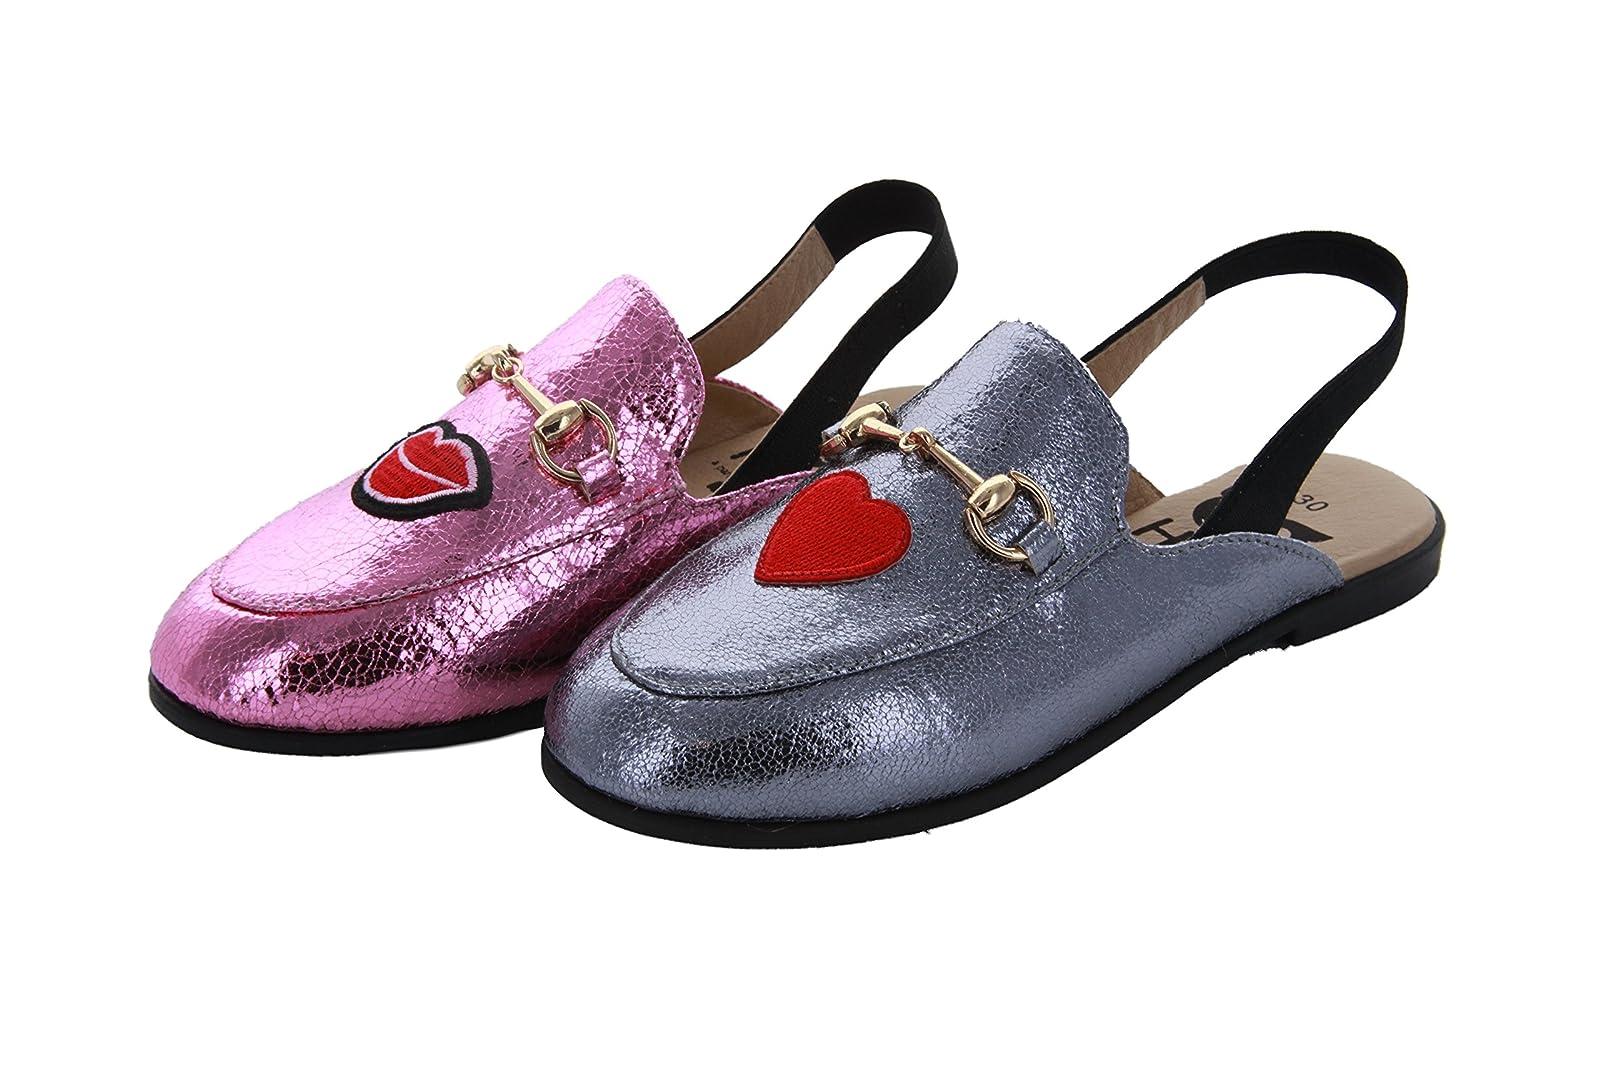 Hoo Shoes - Girls Mule/Slide - Metallic - Fashion - 1